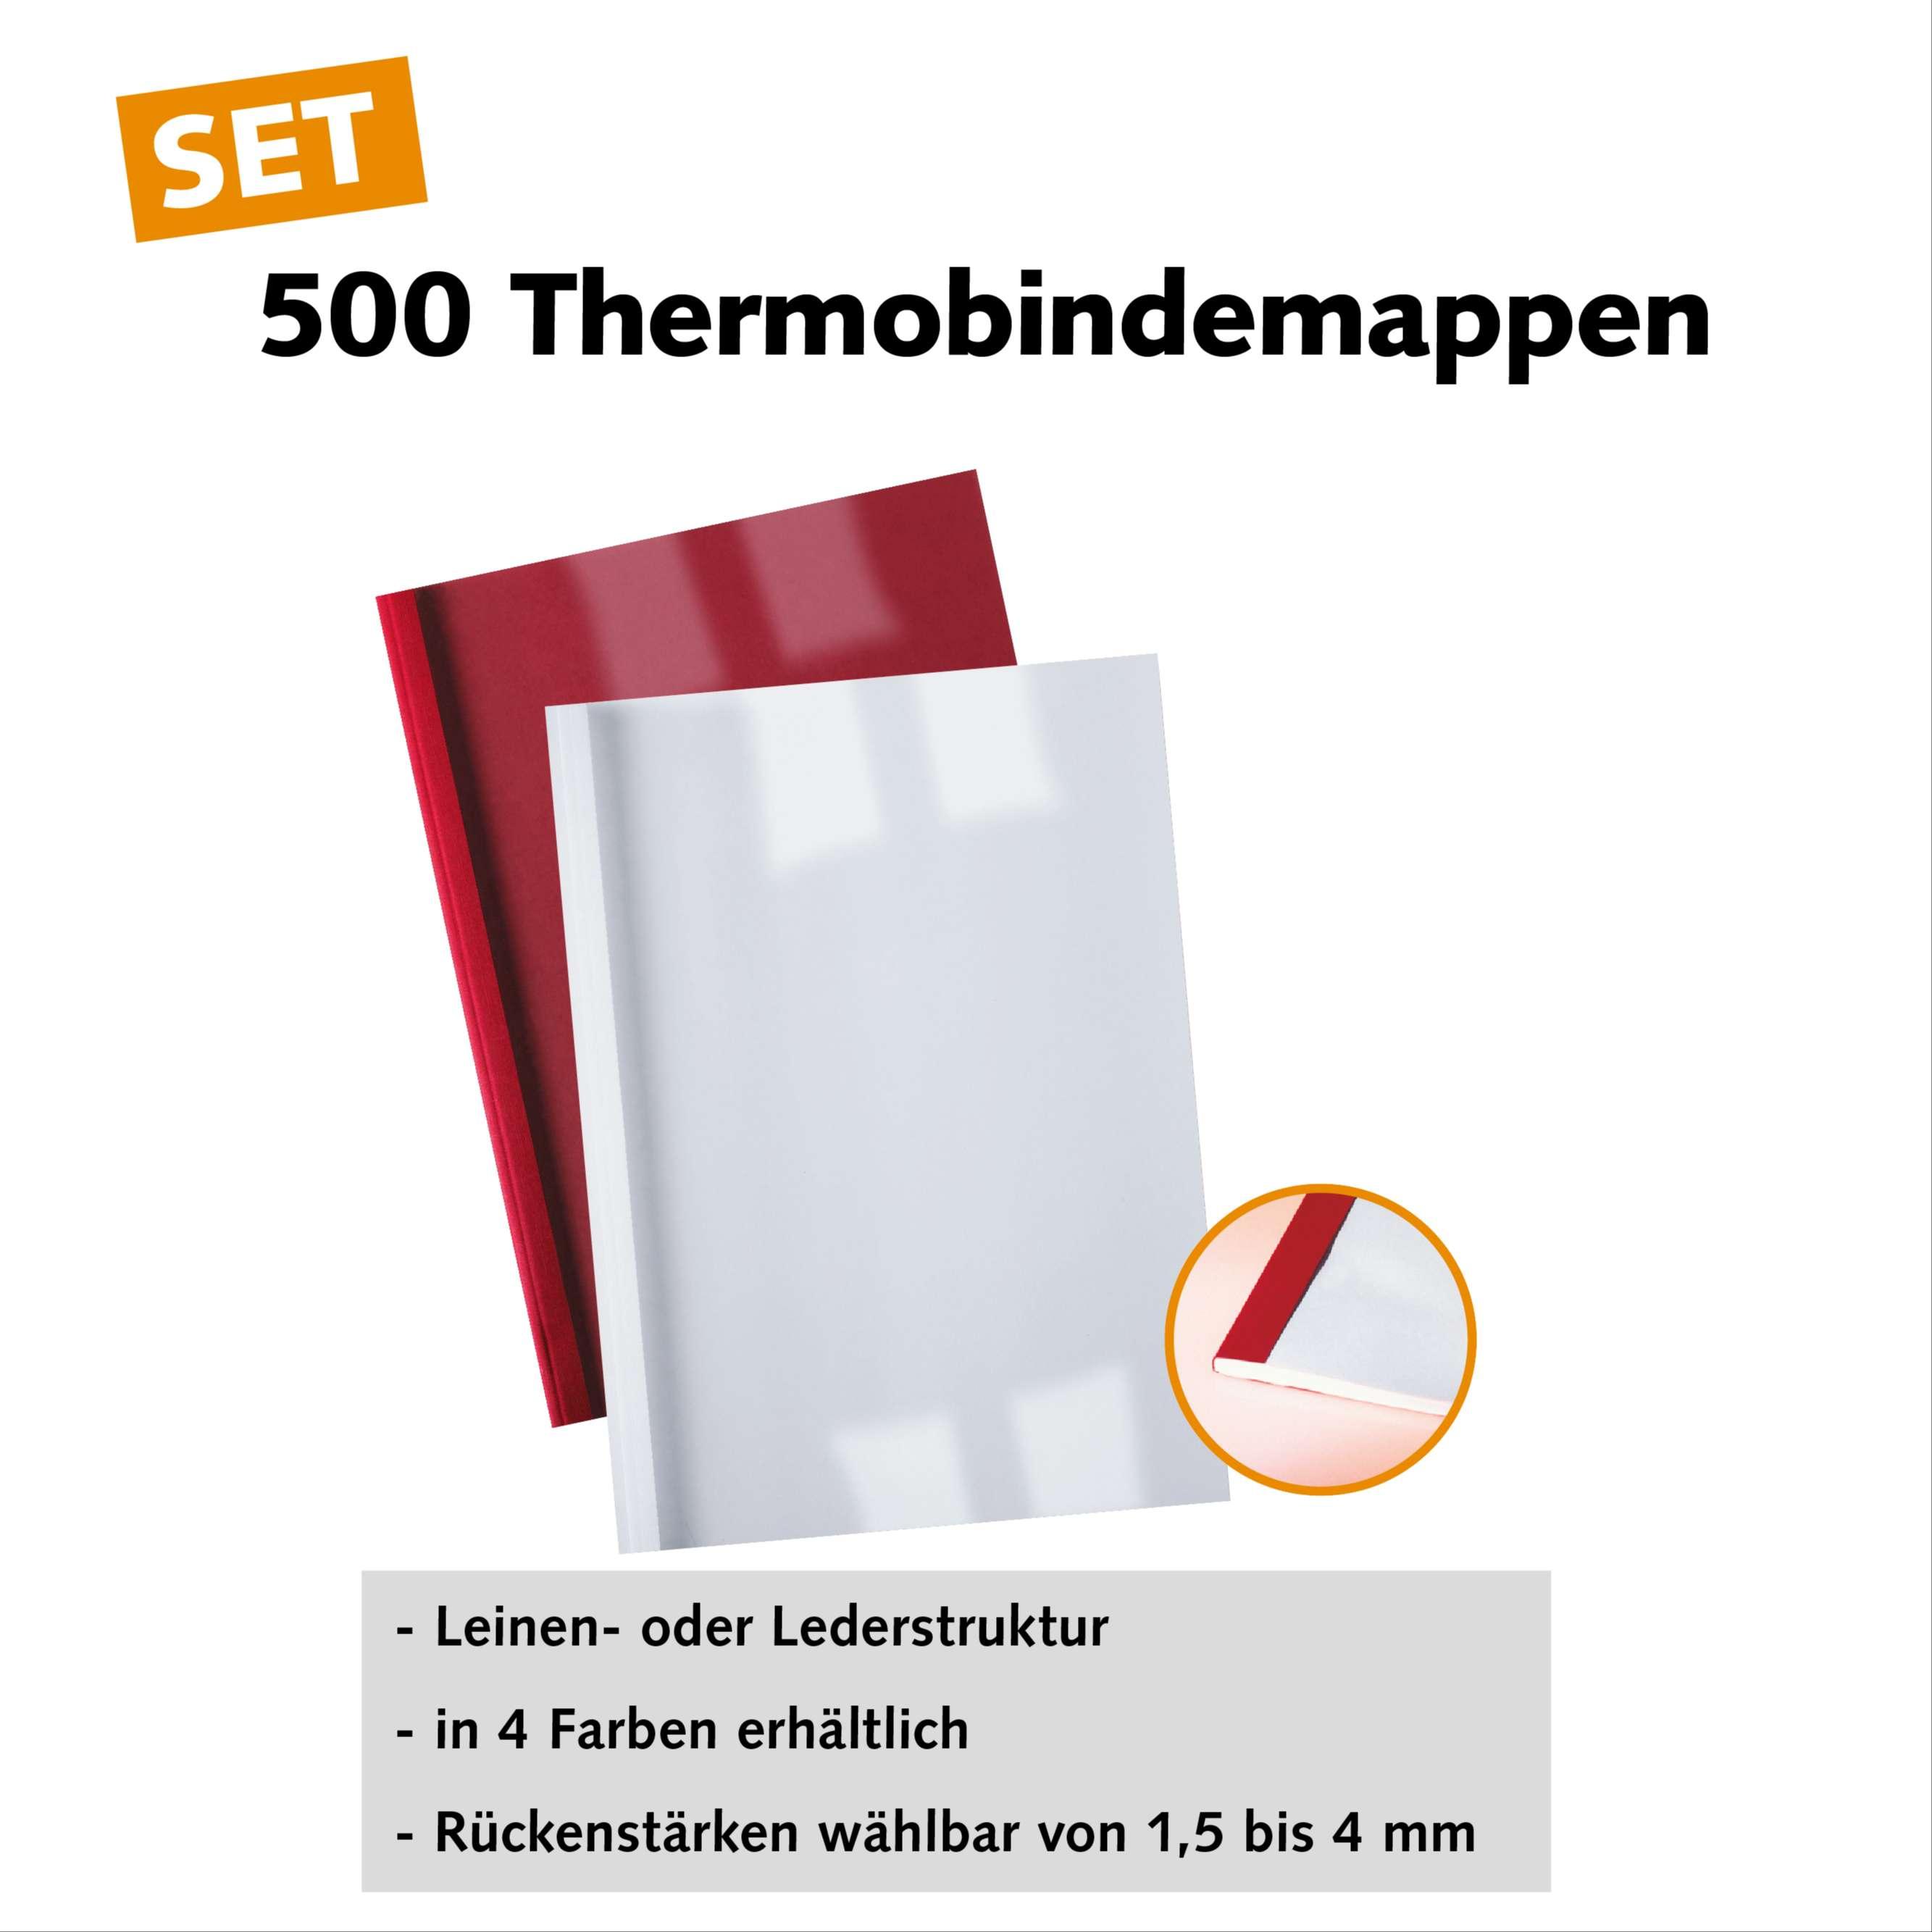 500 Thermobindemappen - Startset